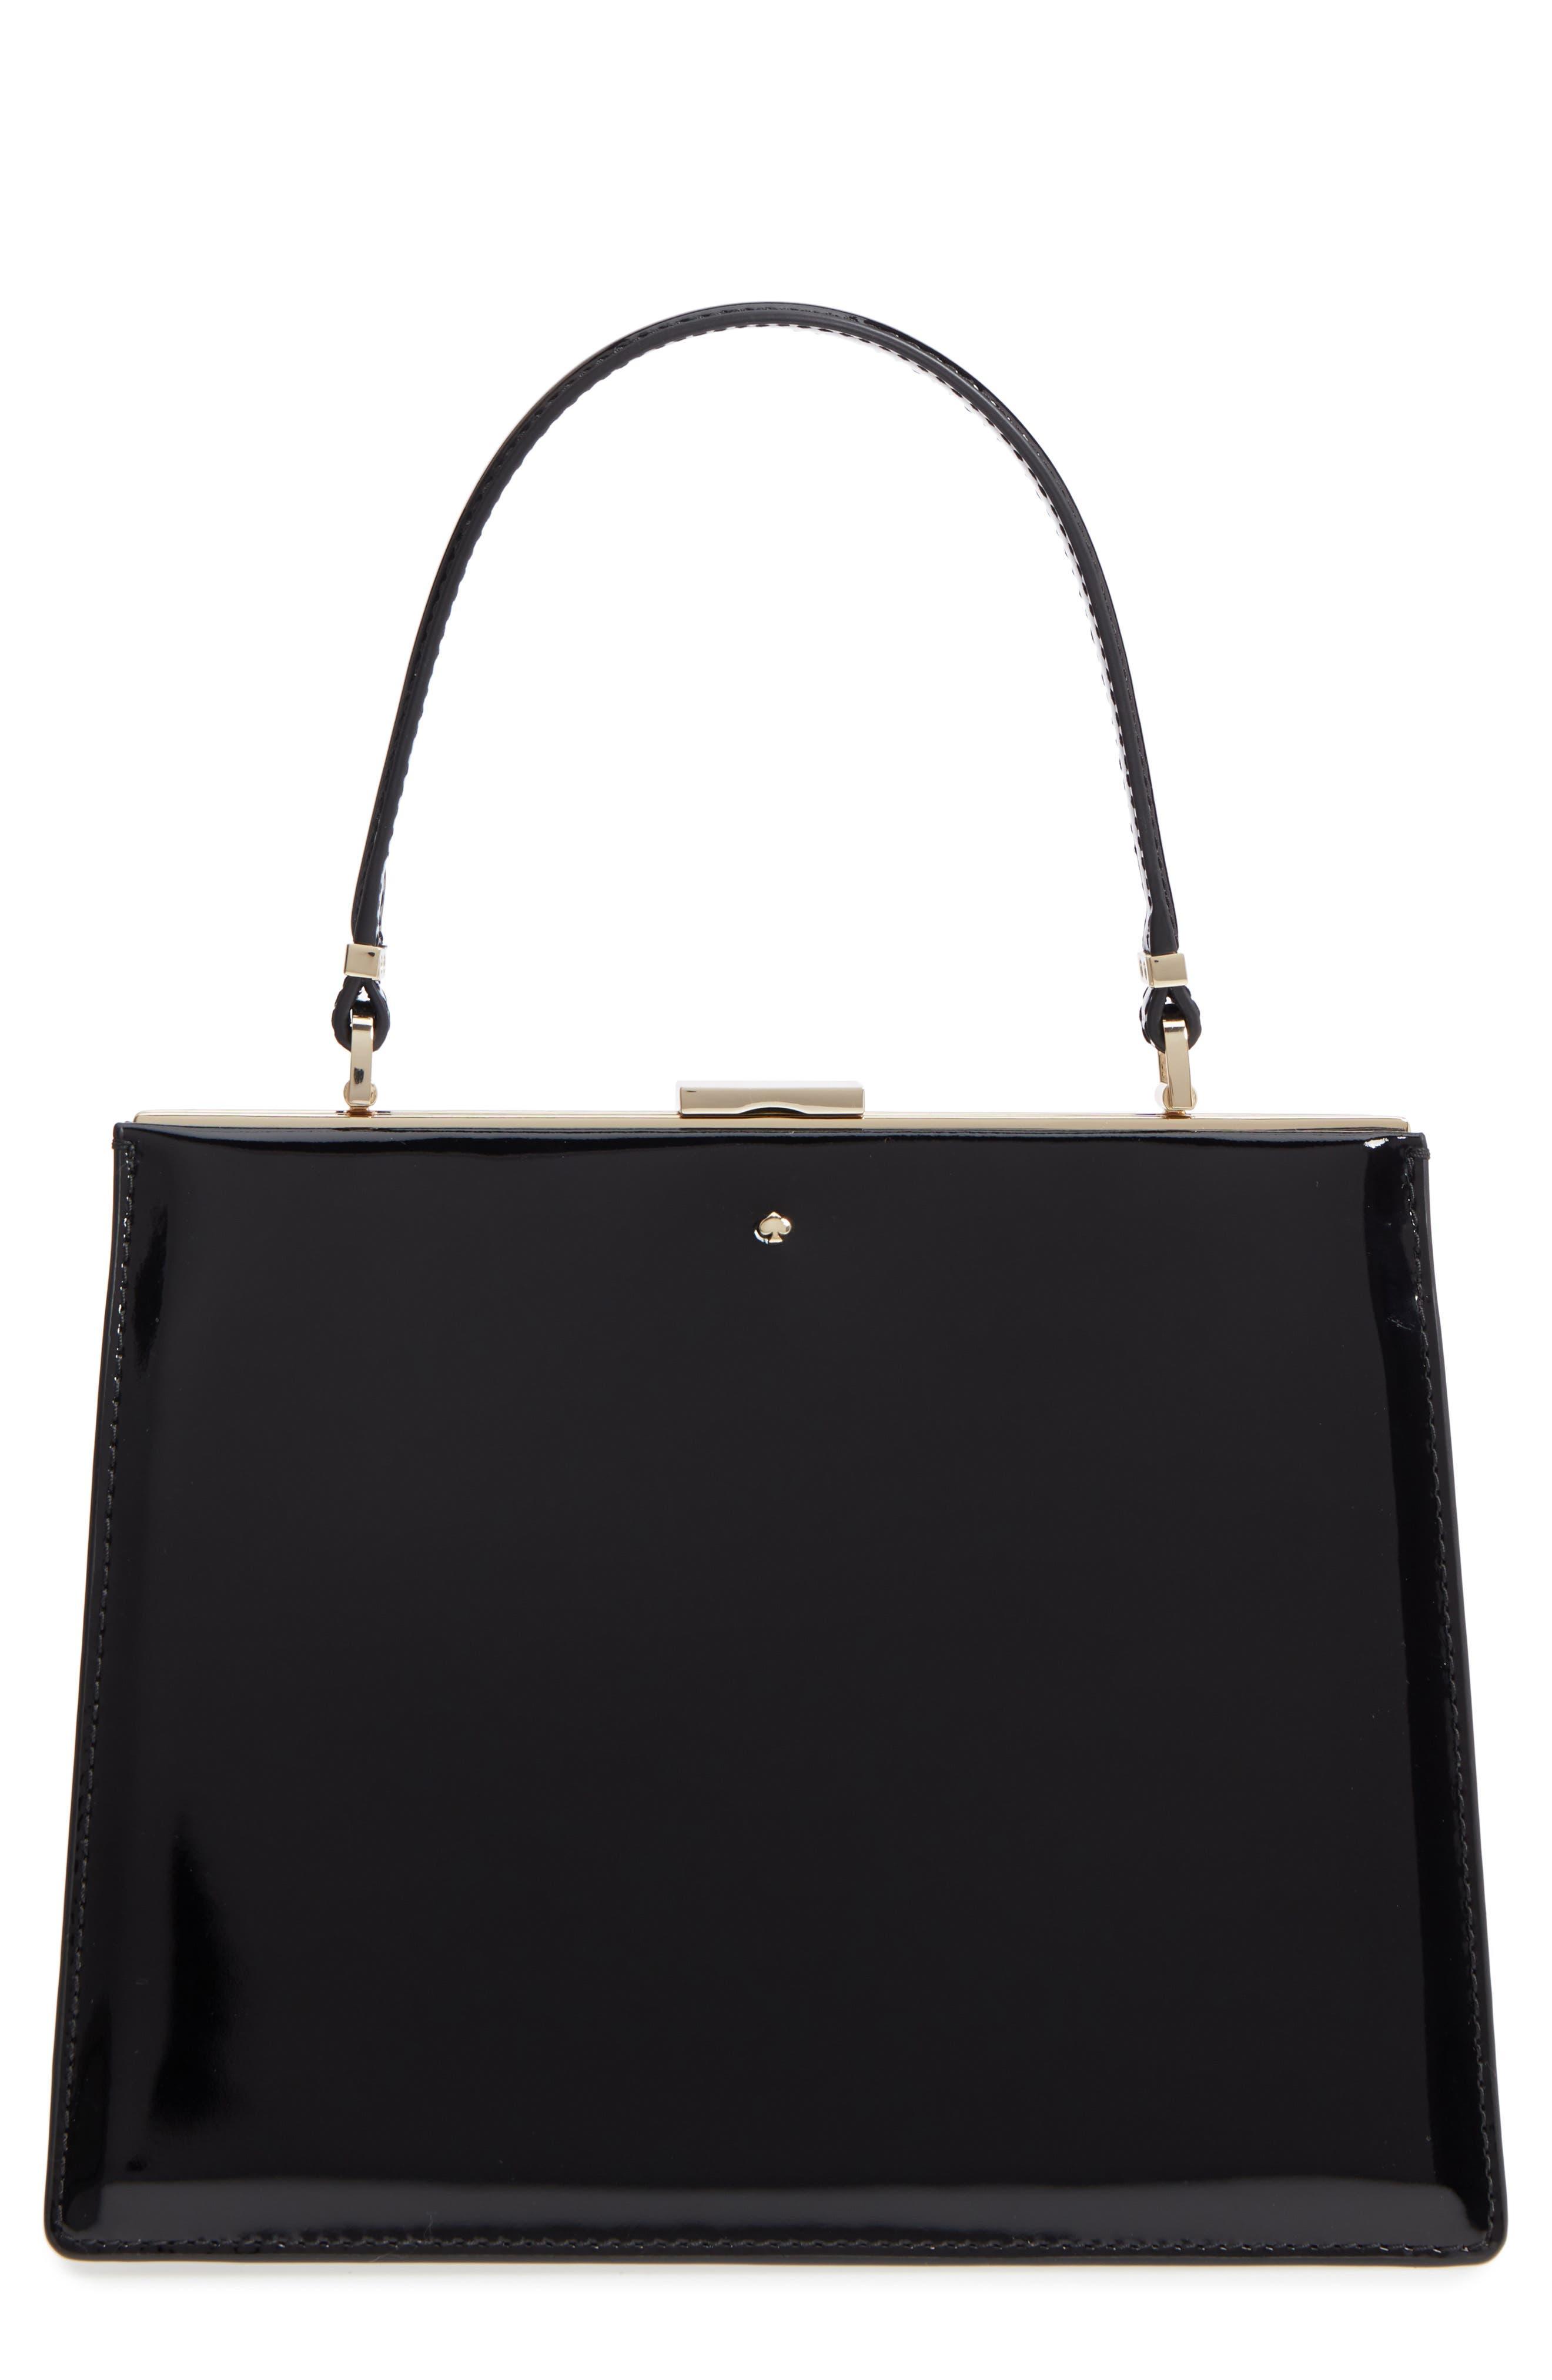 madison moore road - chari leather handbag,                             Main thumbnail 1, color,                             001